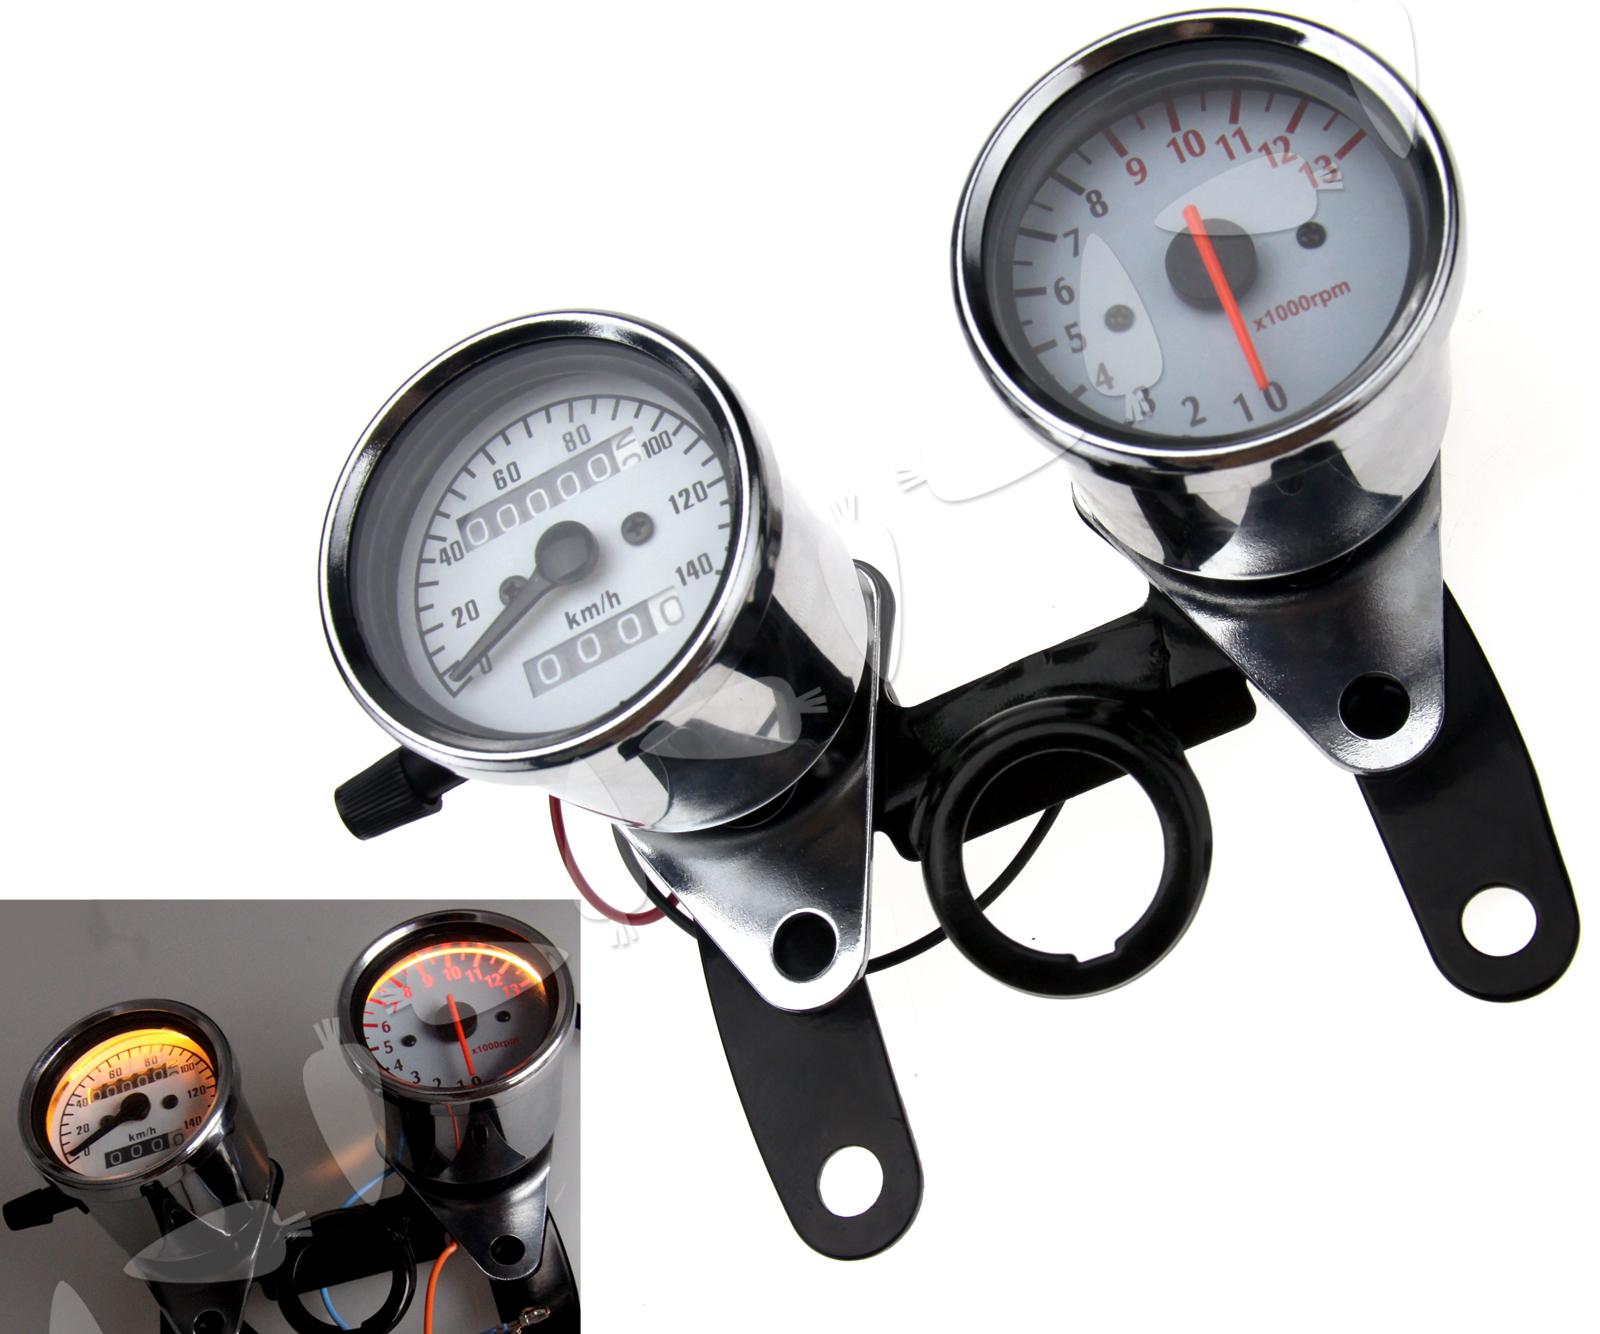 12v Led Universal Motorcycle Odometer Tachometer